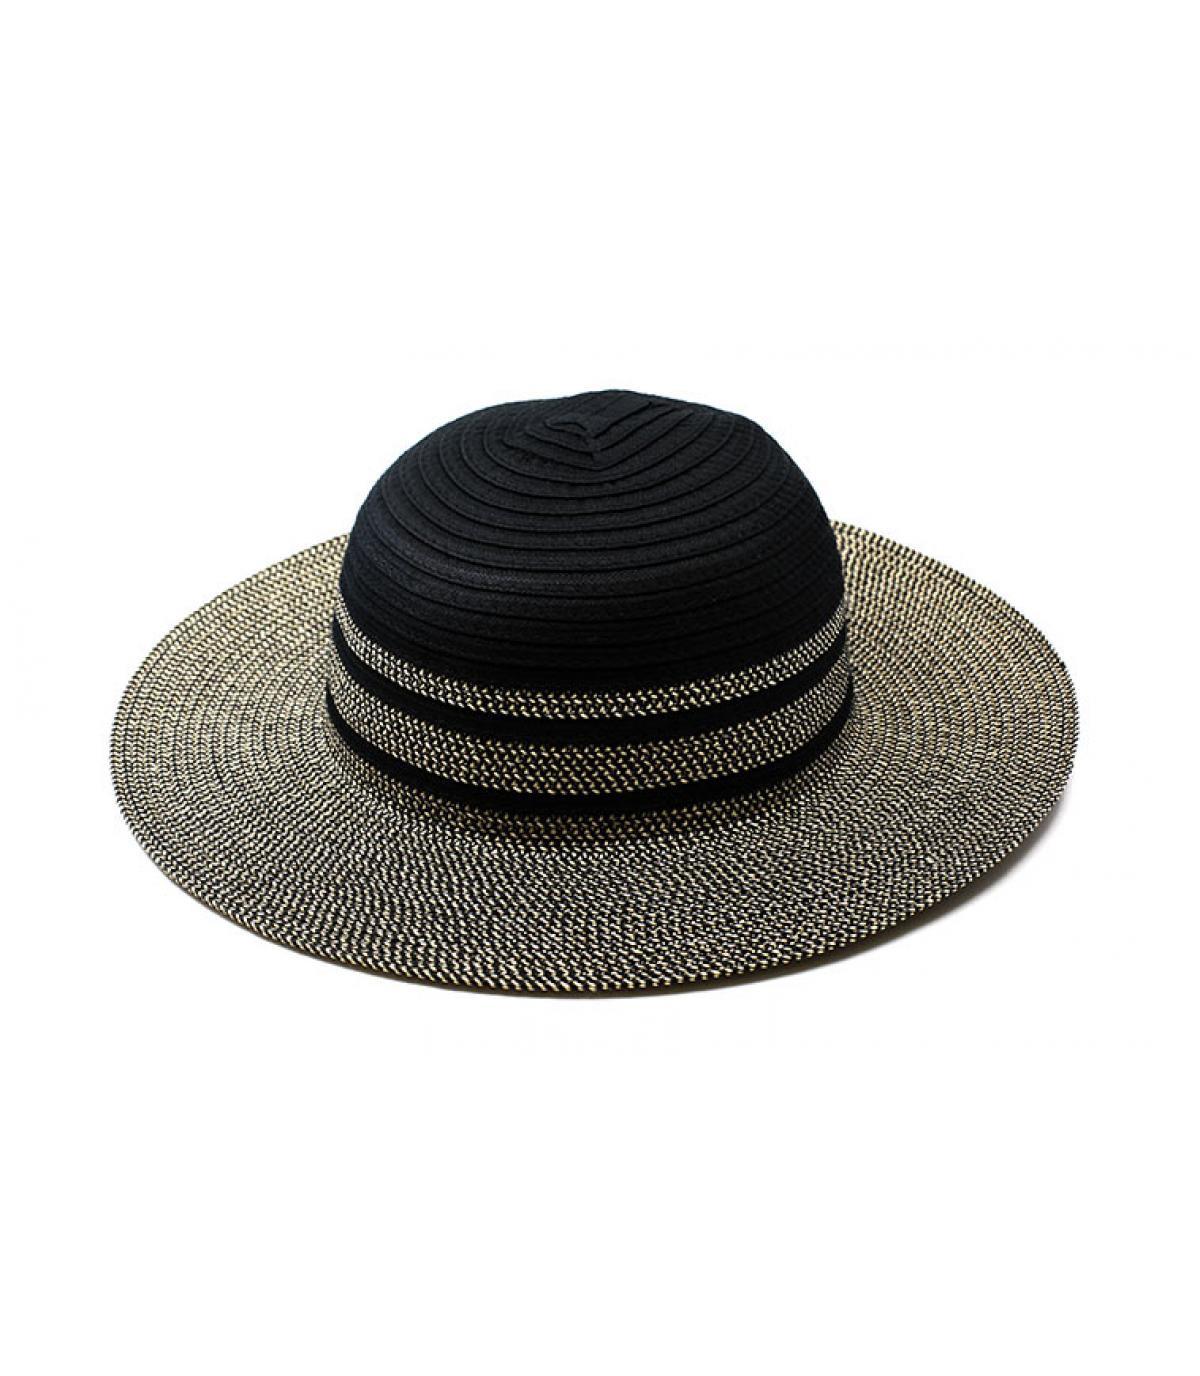 Capeline Strohhut schwarz